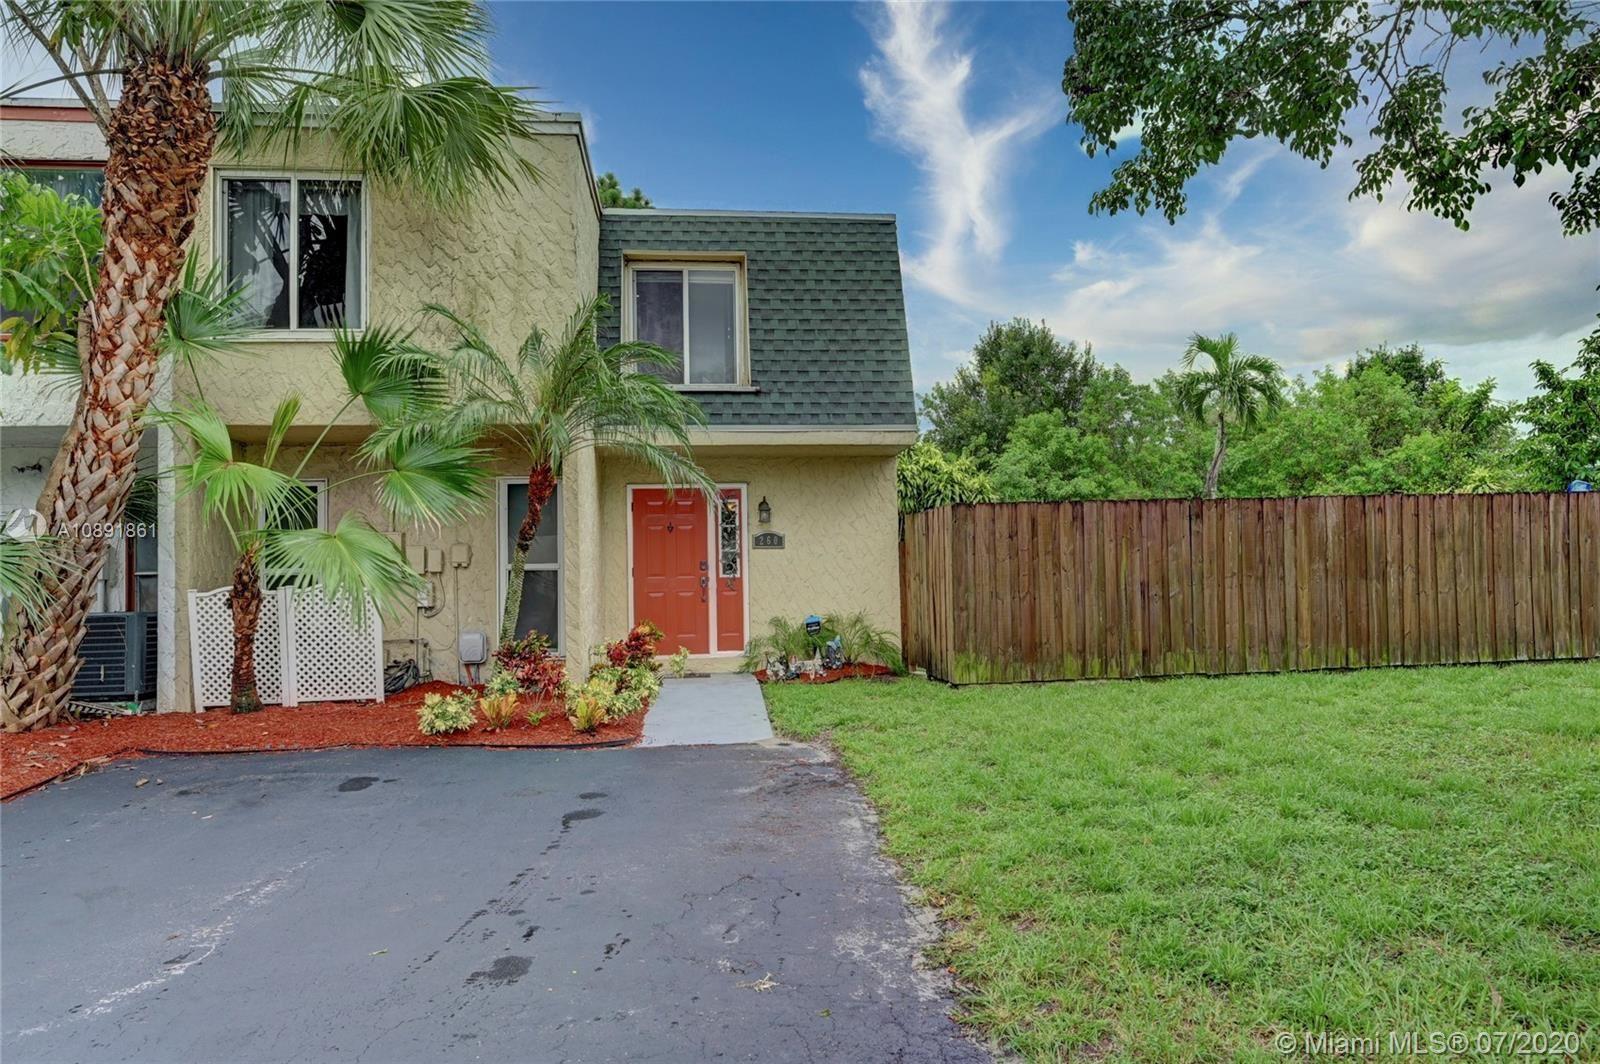 260 Sunshine Dr, Coconut Creek, FL 33066 - #: A10891861